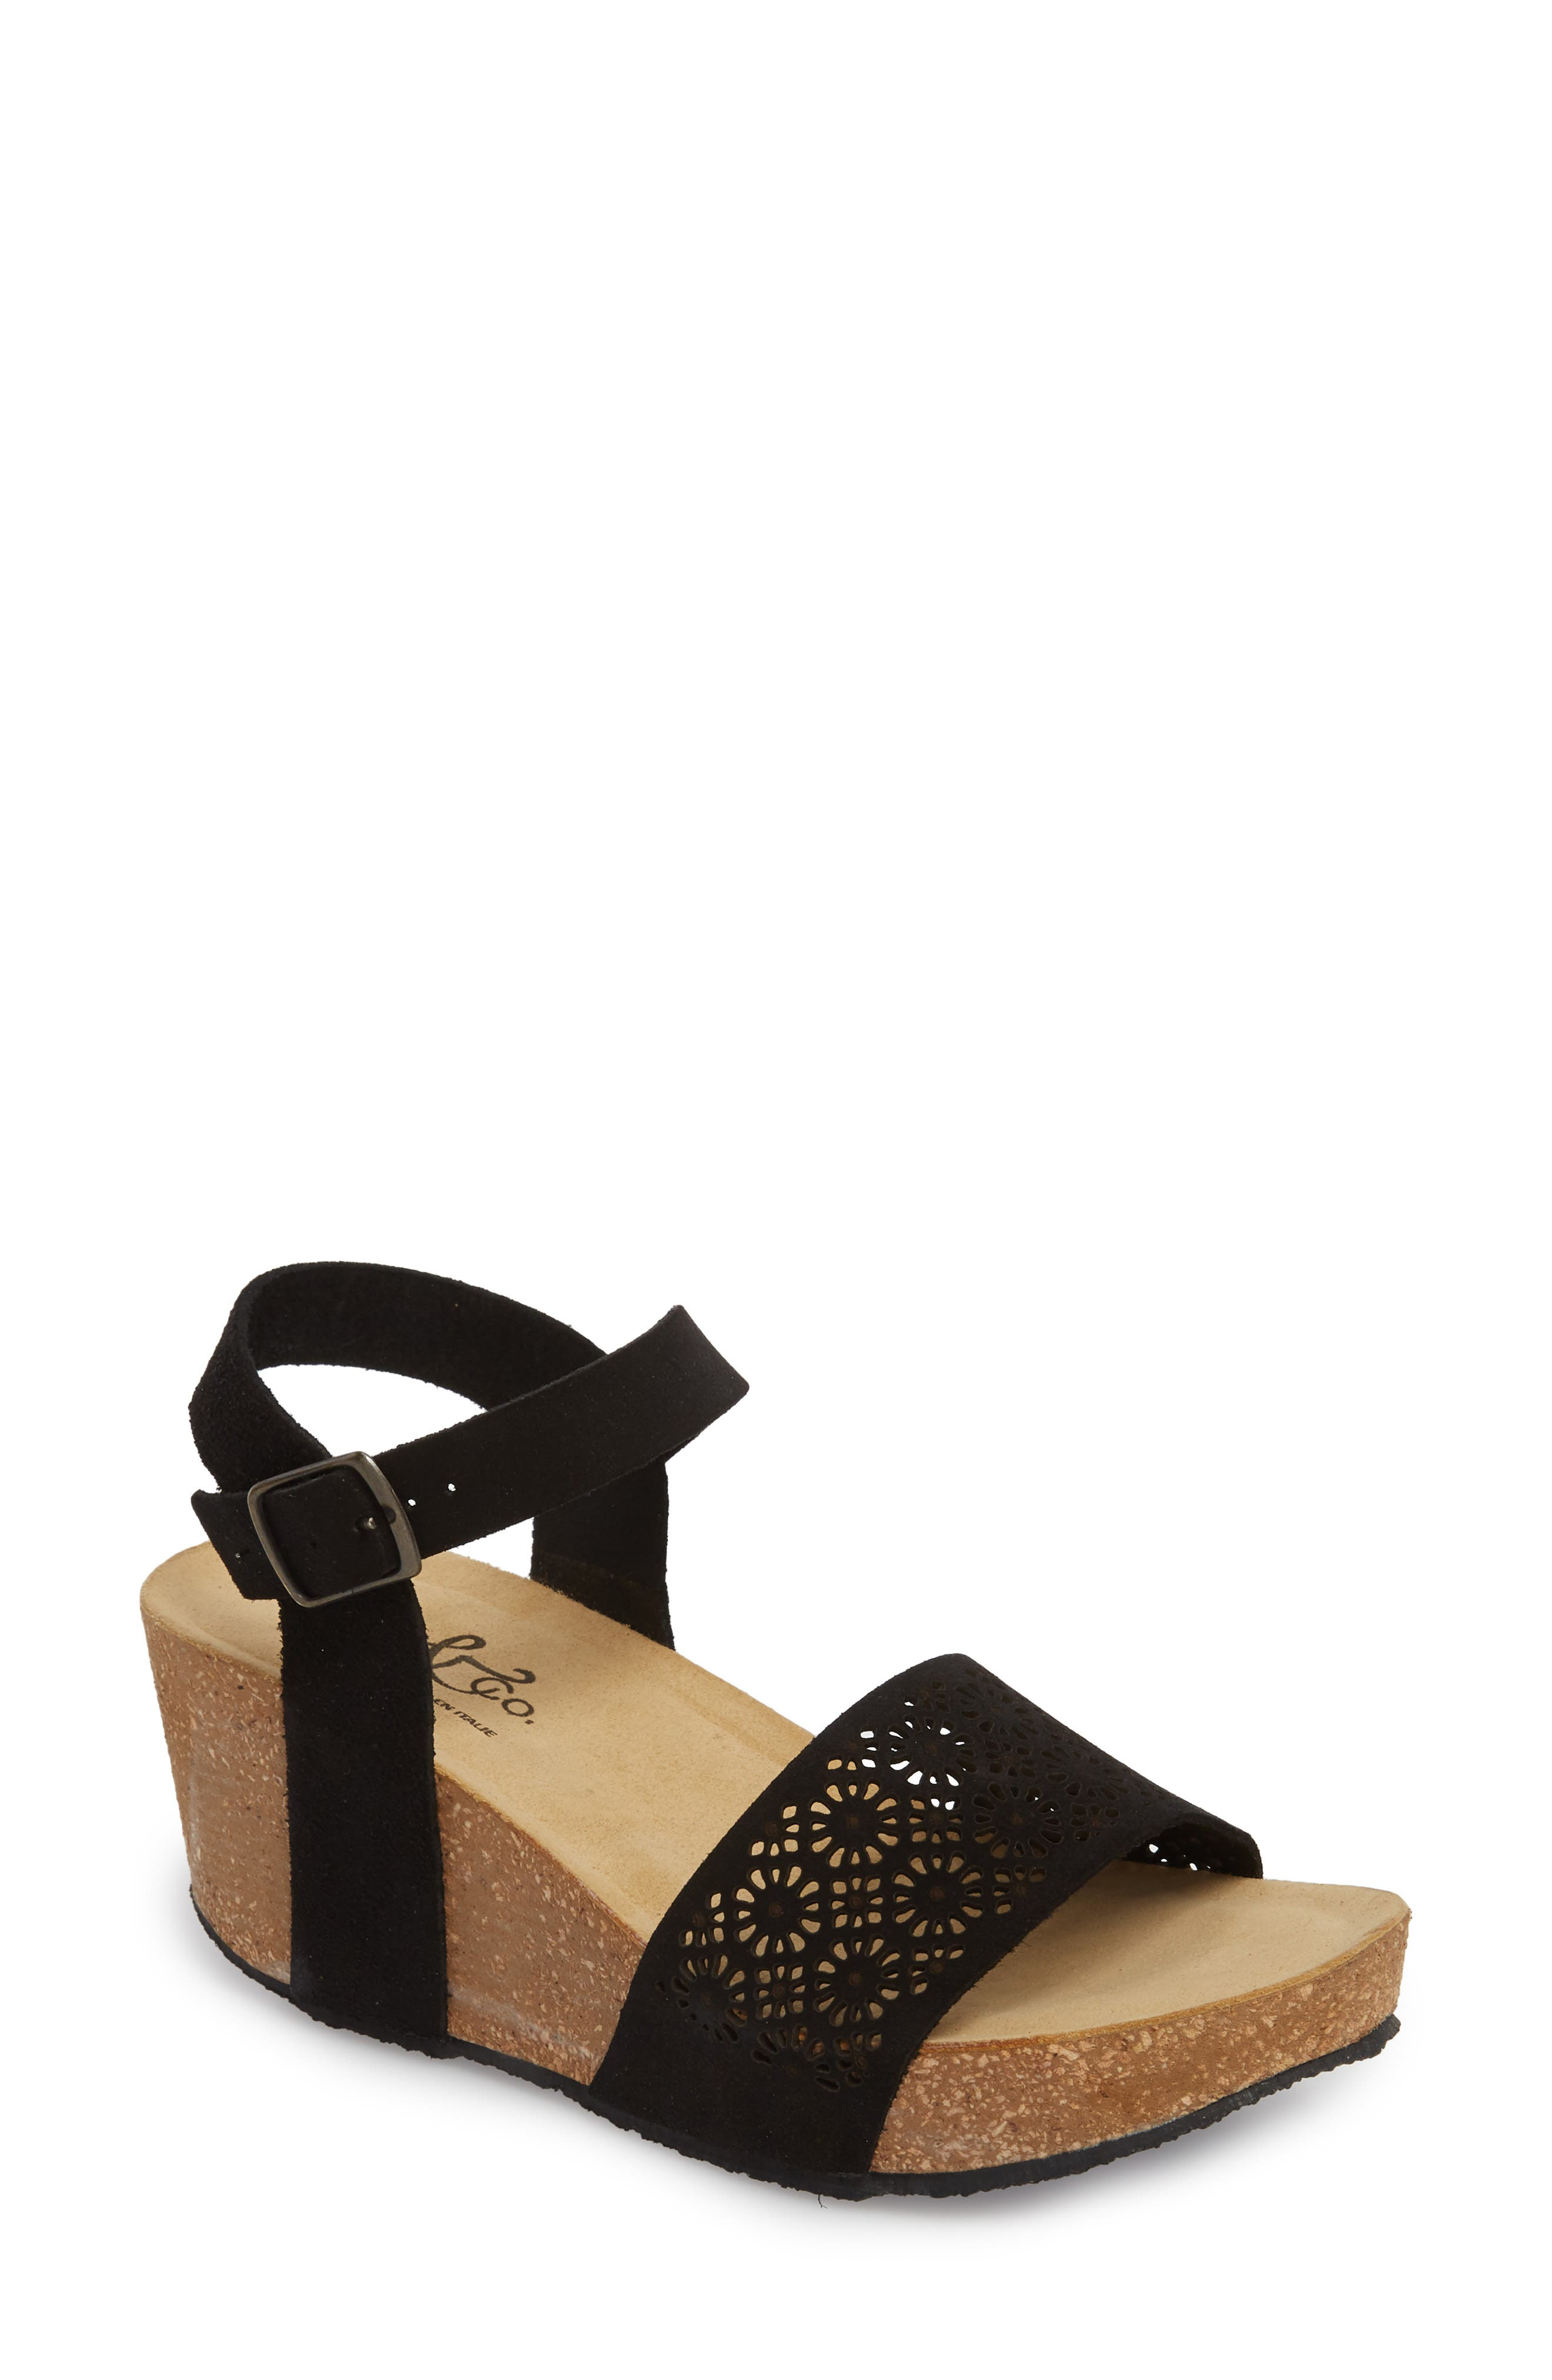 Lolo Platform Wedge Sandal,                         Main,                         color, BLACK SUEDE